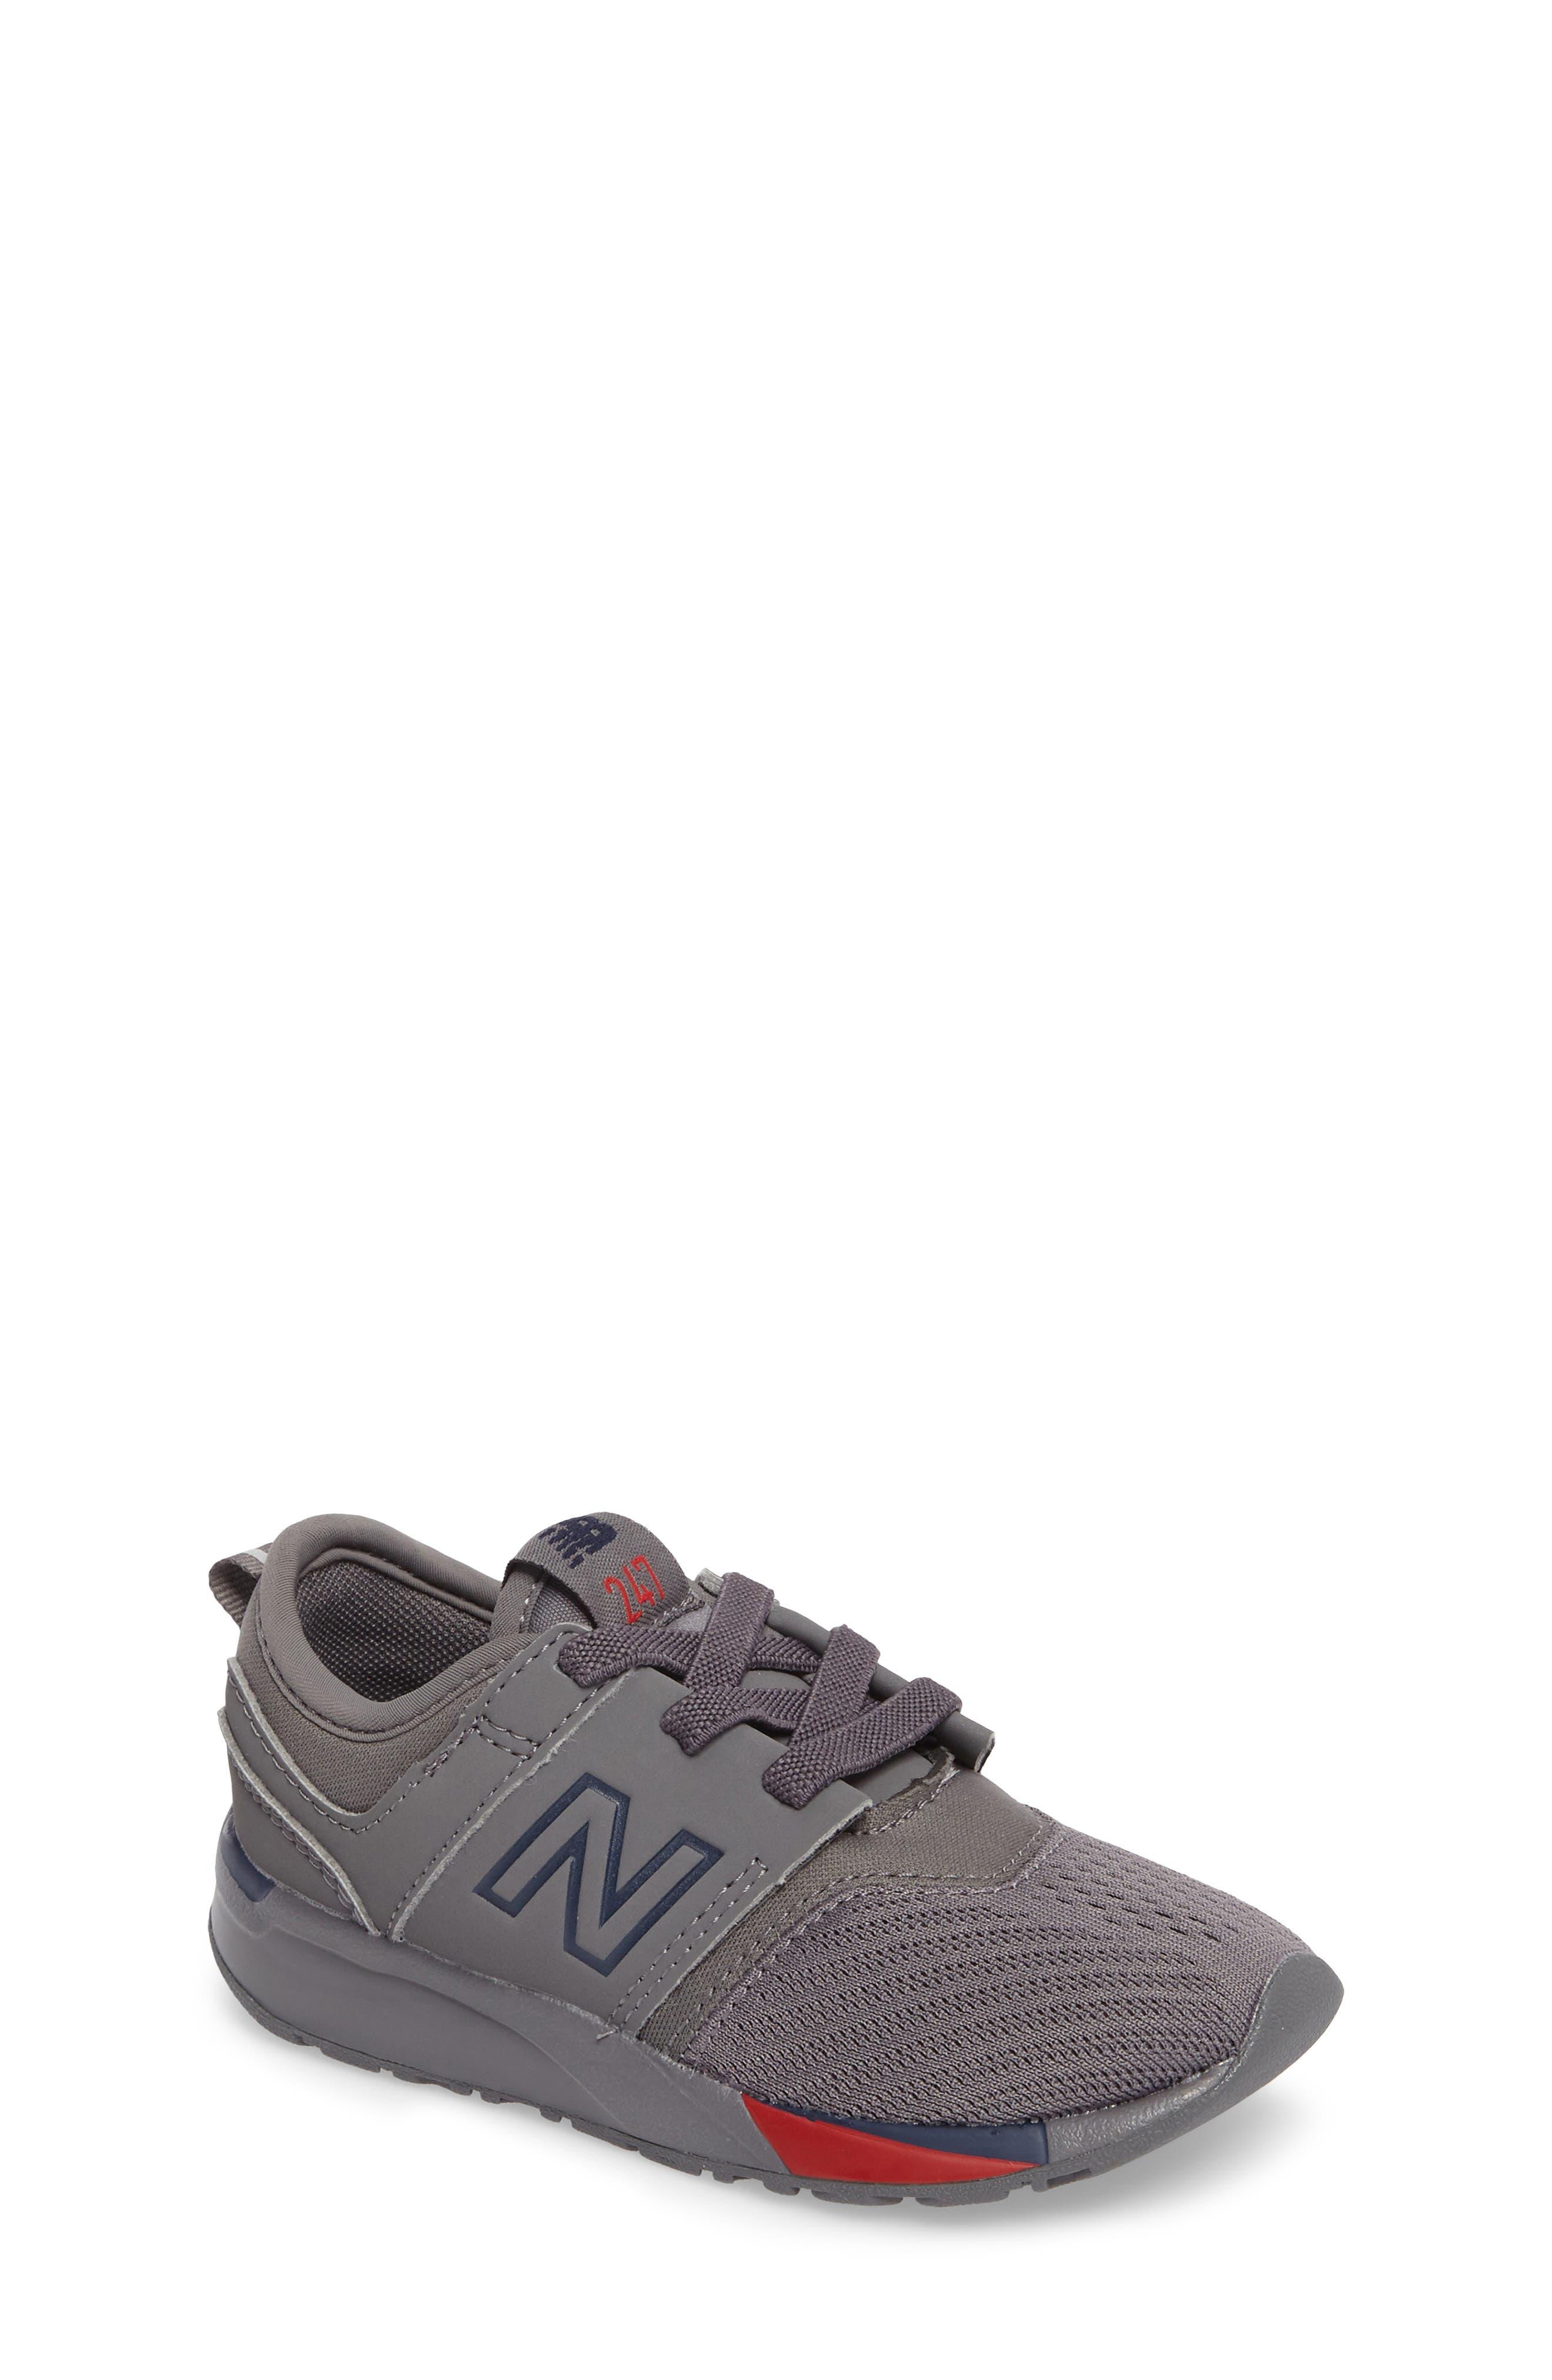 247 Sport Sneaker,                             Main thumbnail 1, color,                             039